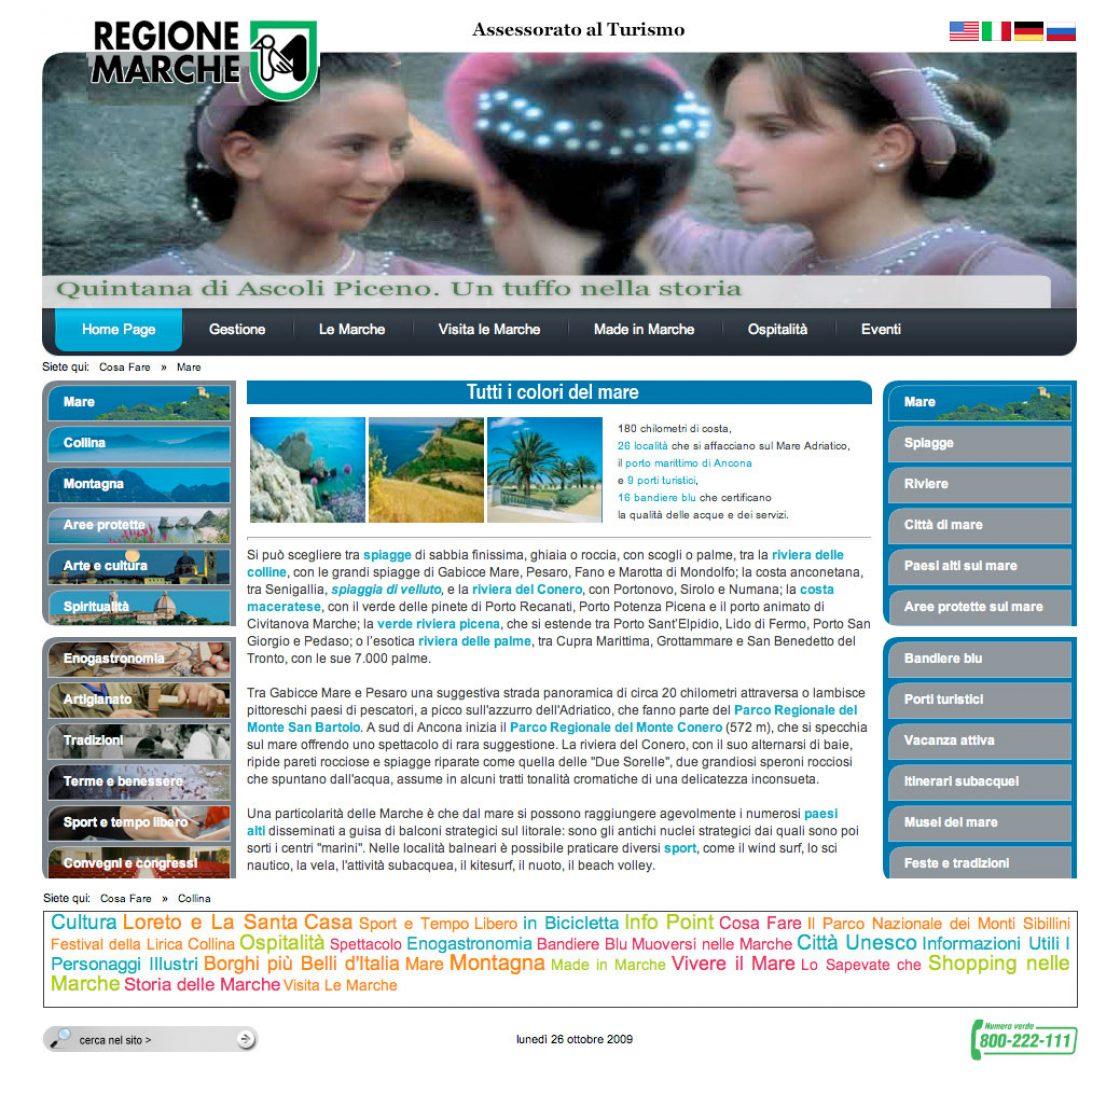 Visit-Regione-Marche-BestPlace-mare